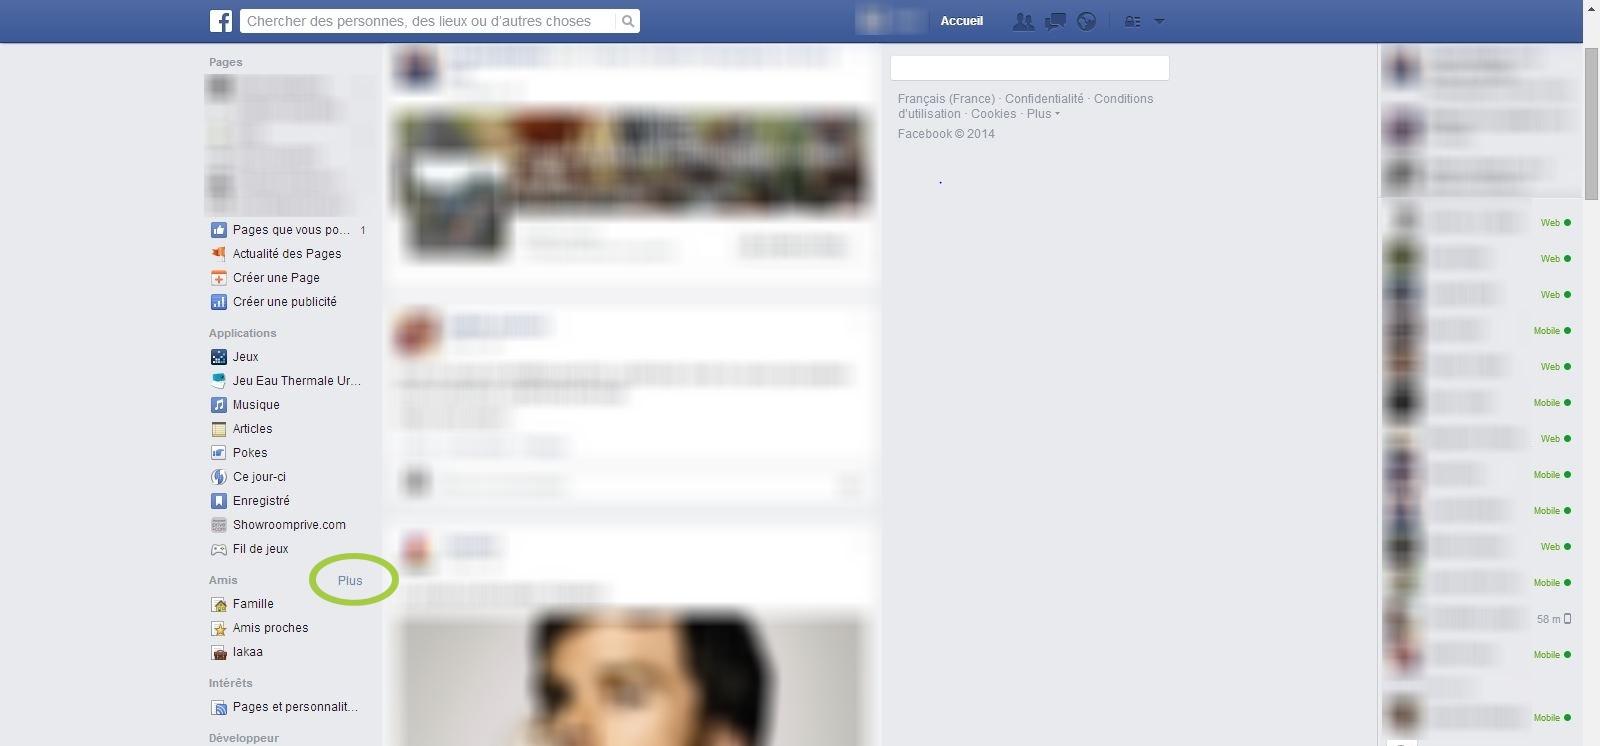 accueil facebook en français